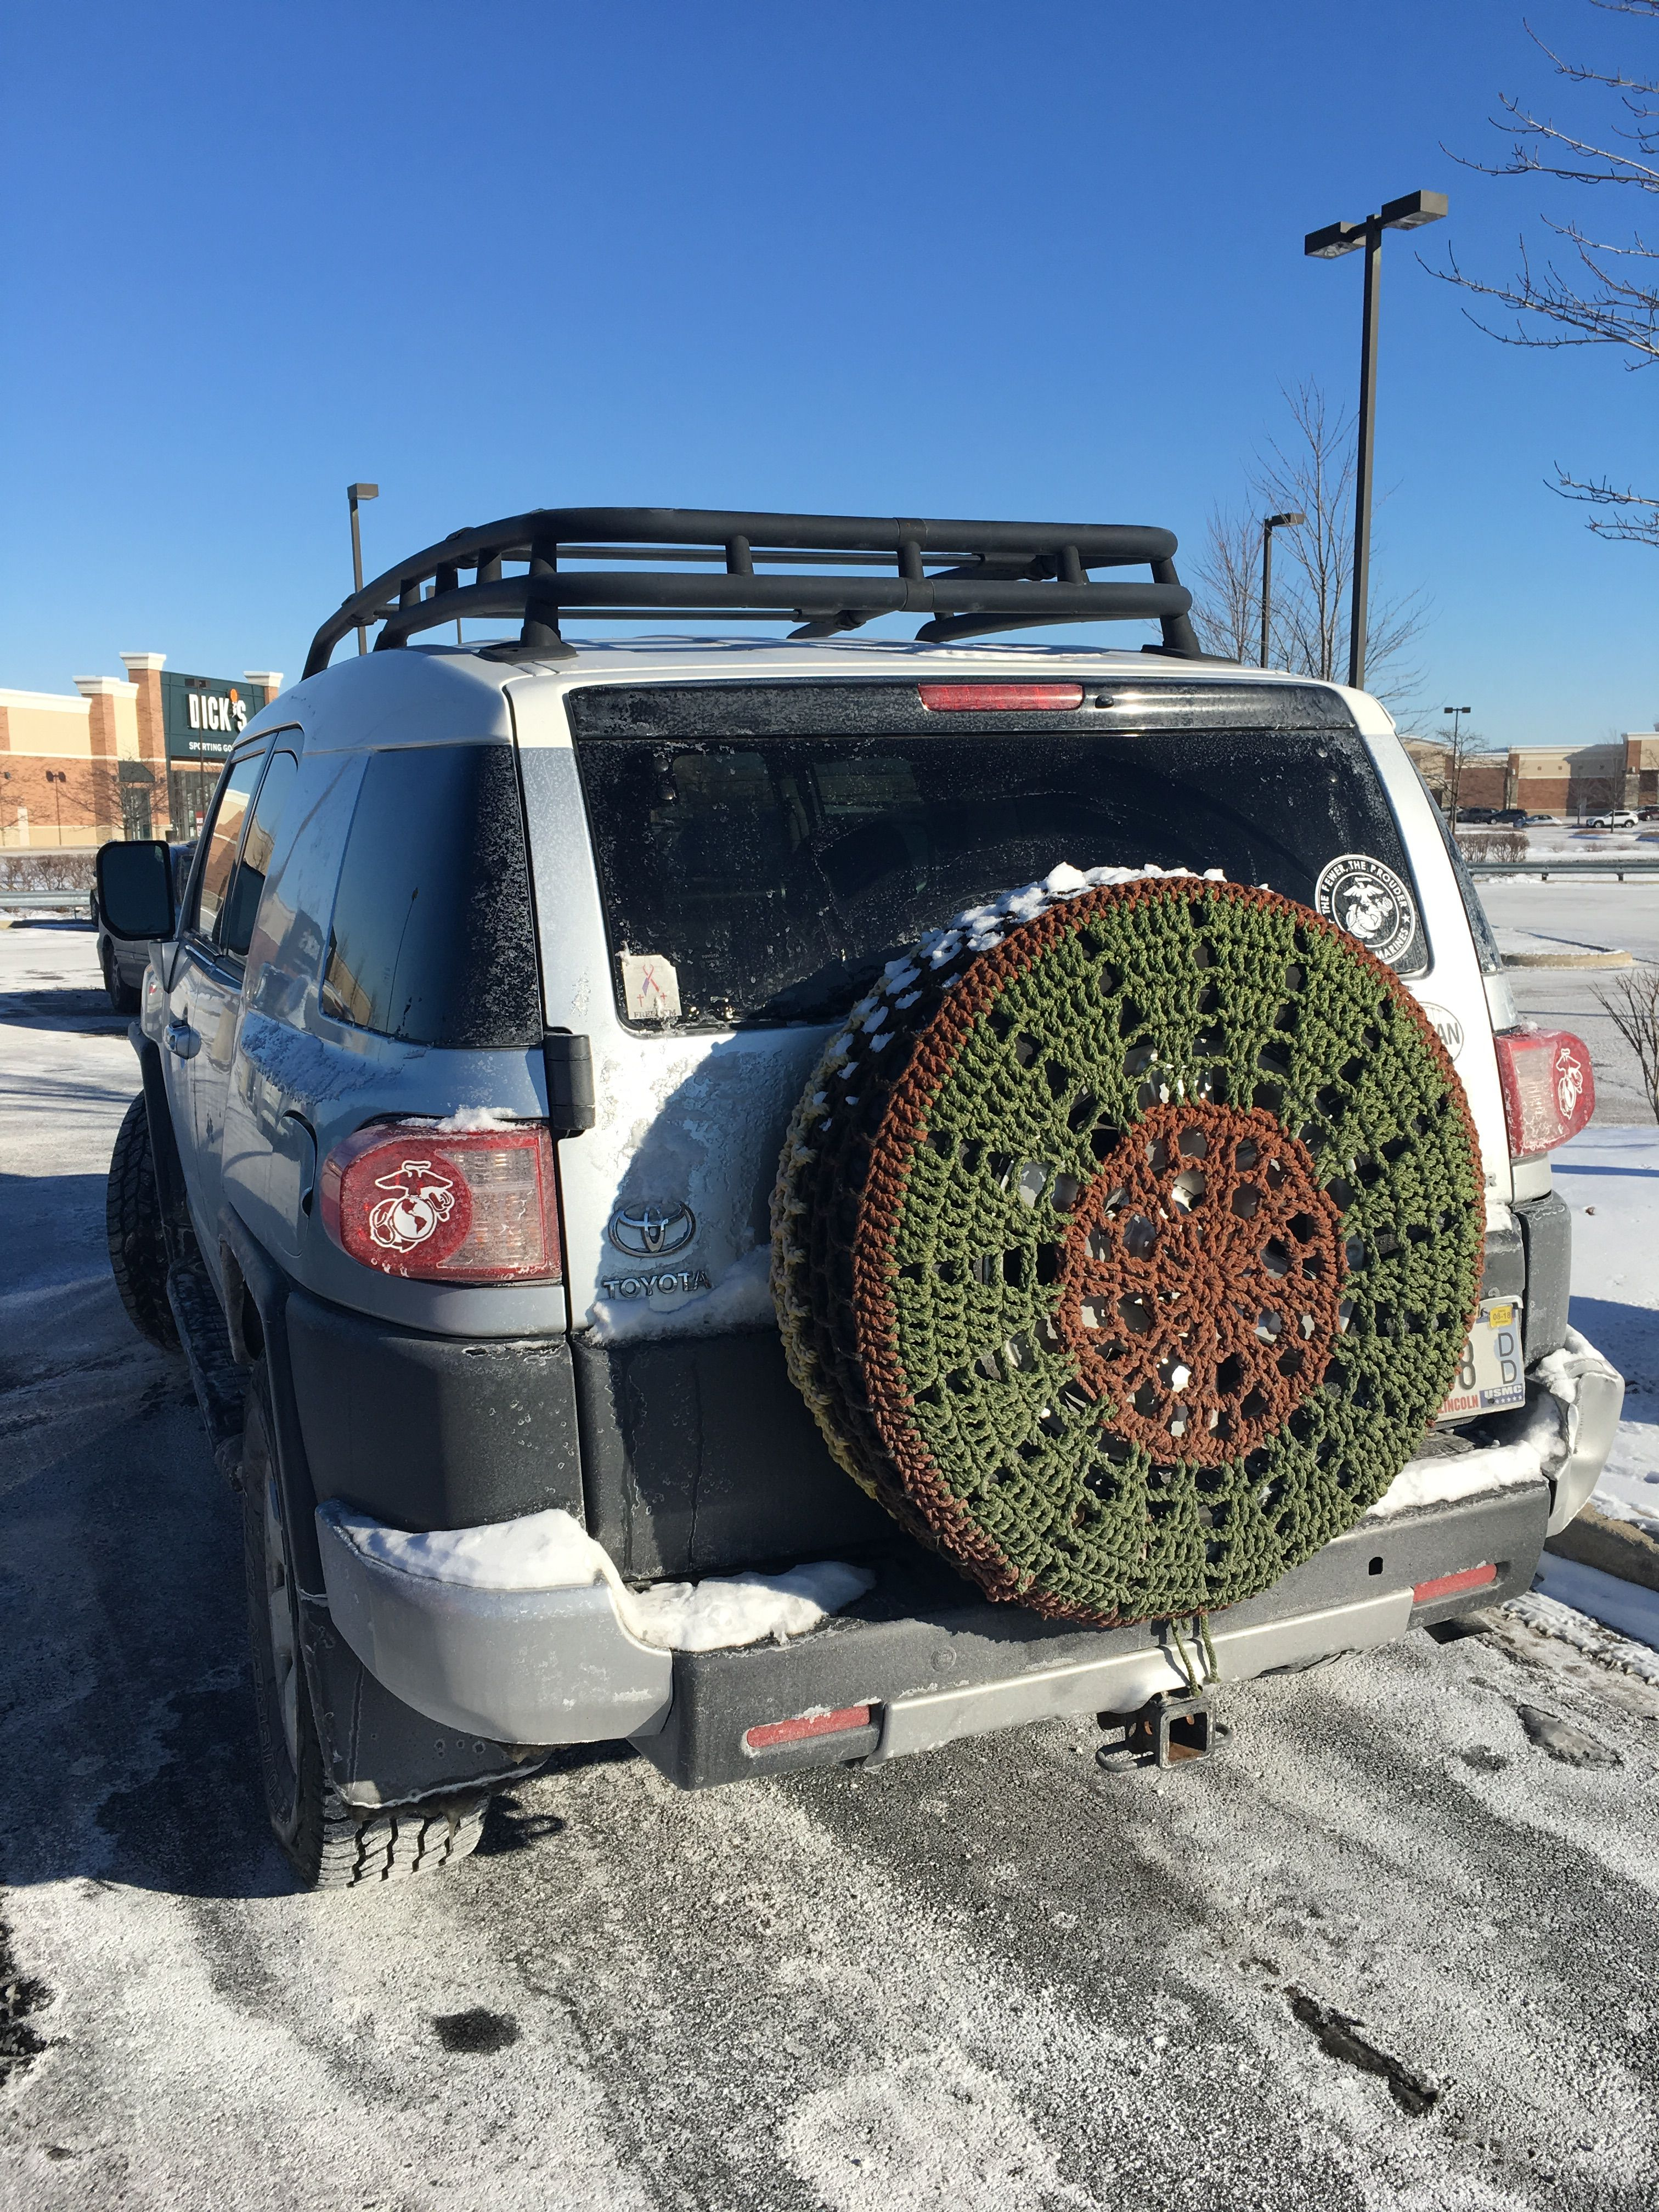 usmc jeep tire covers